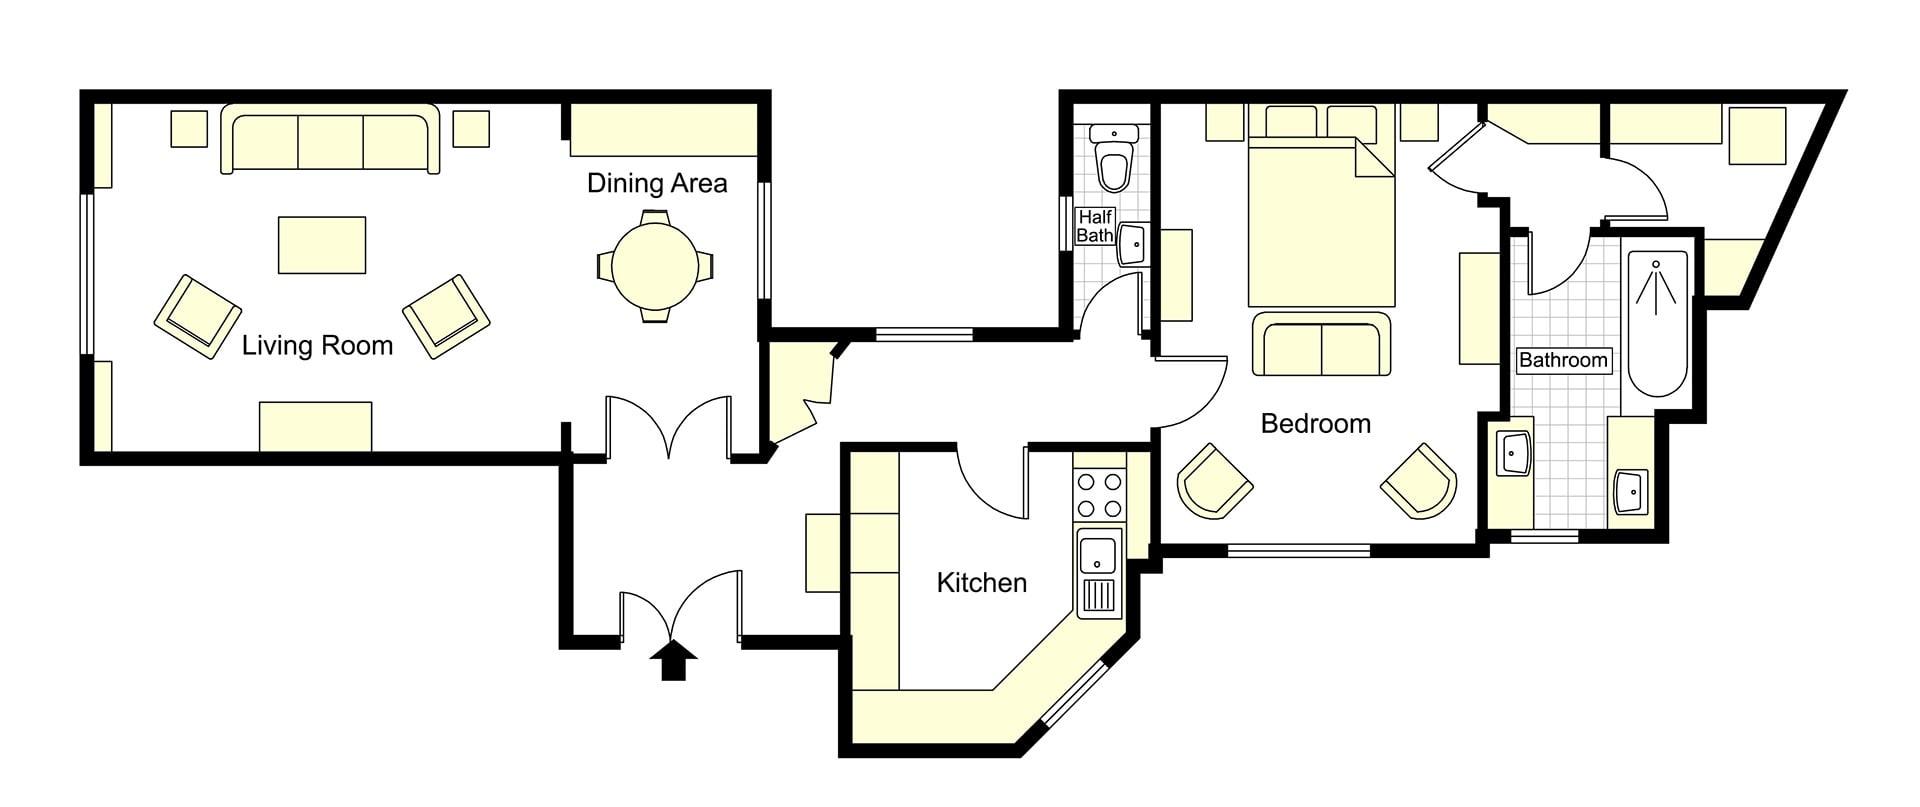 Folle Blanche Floorplan